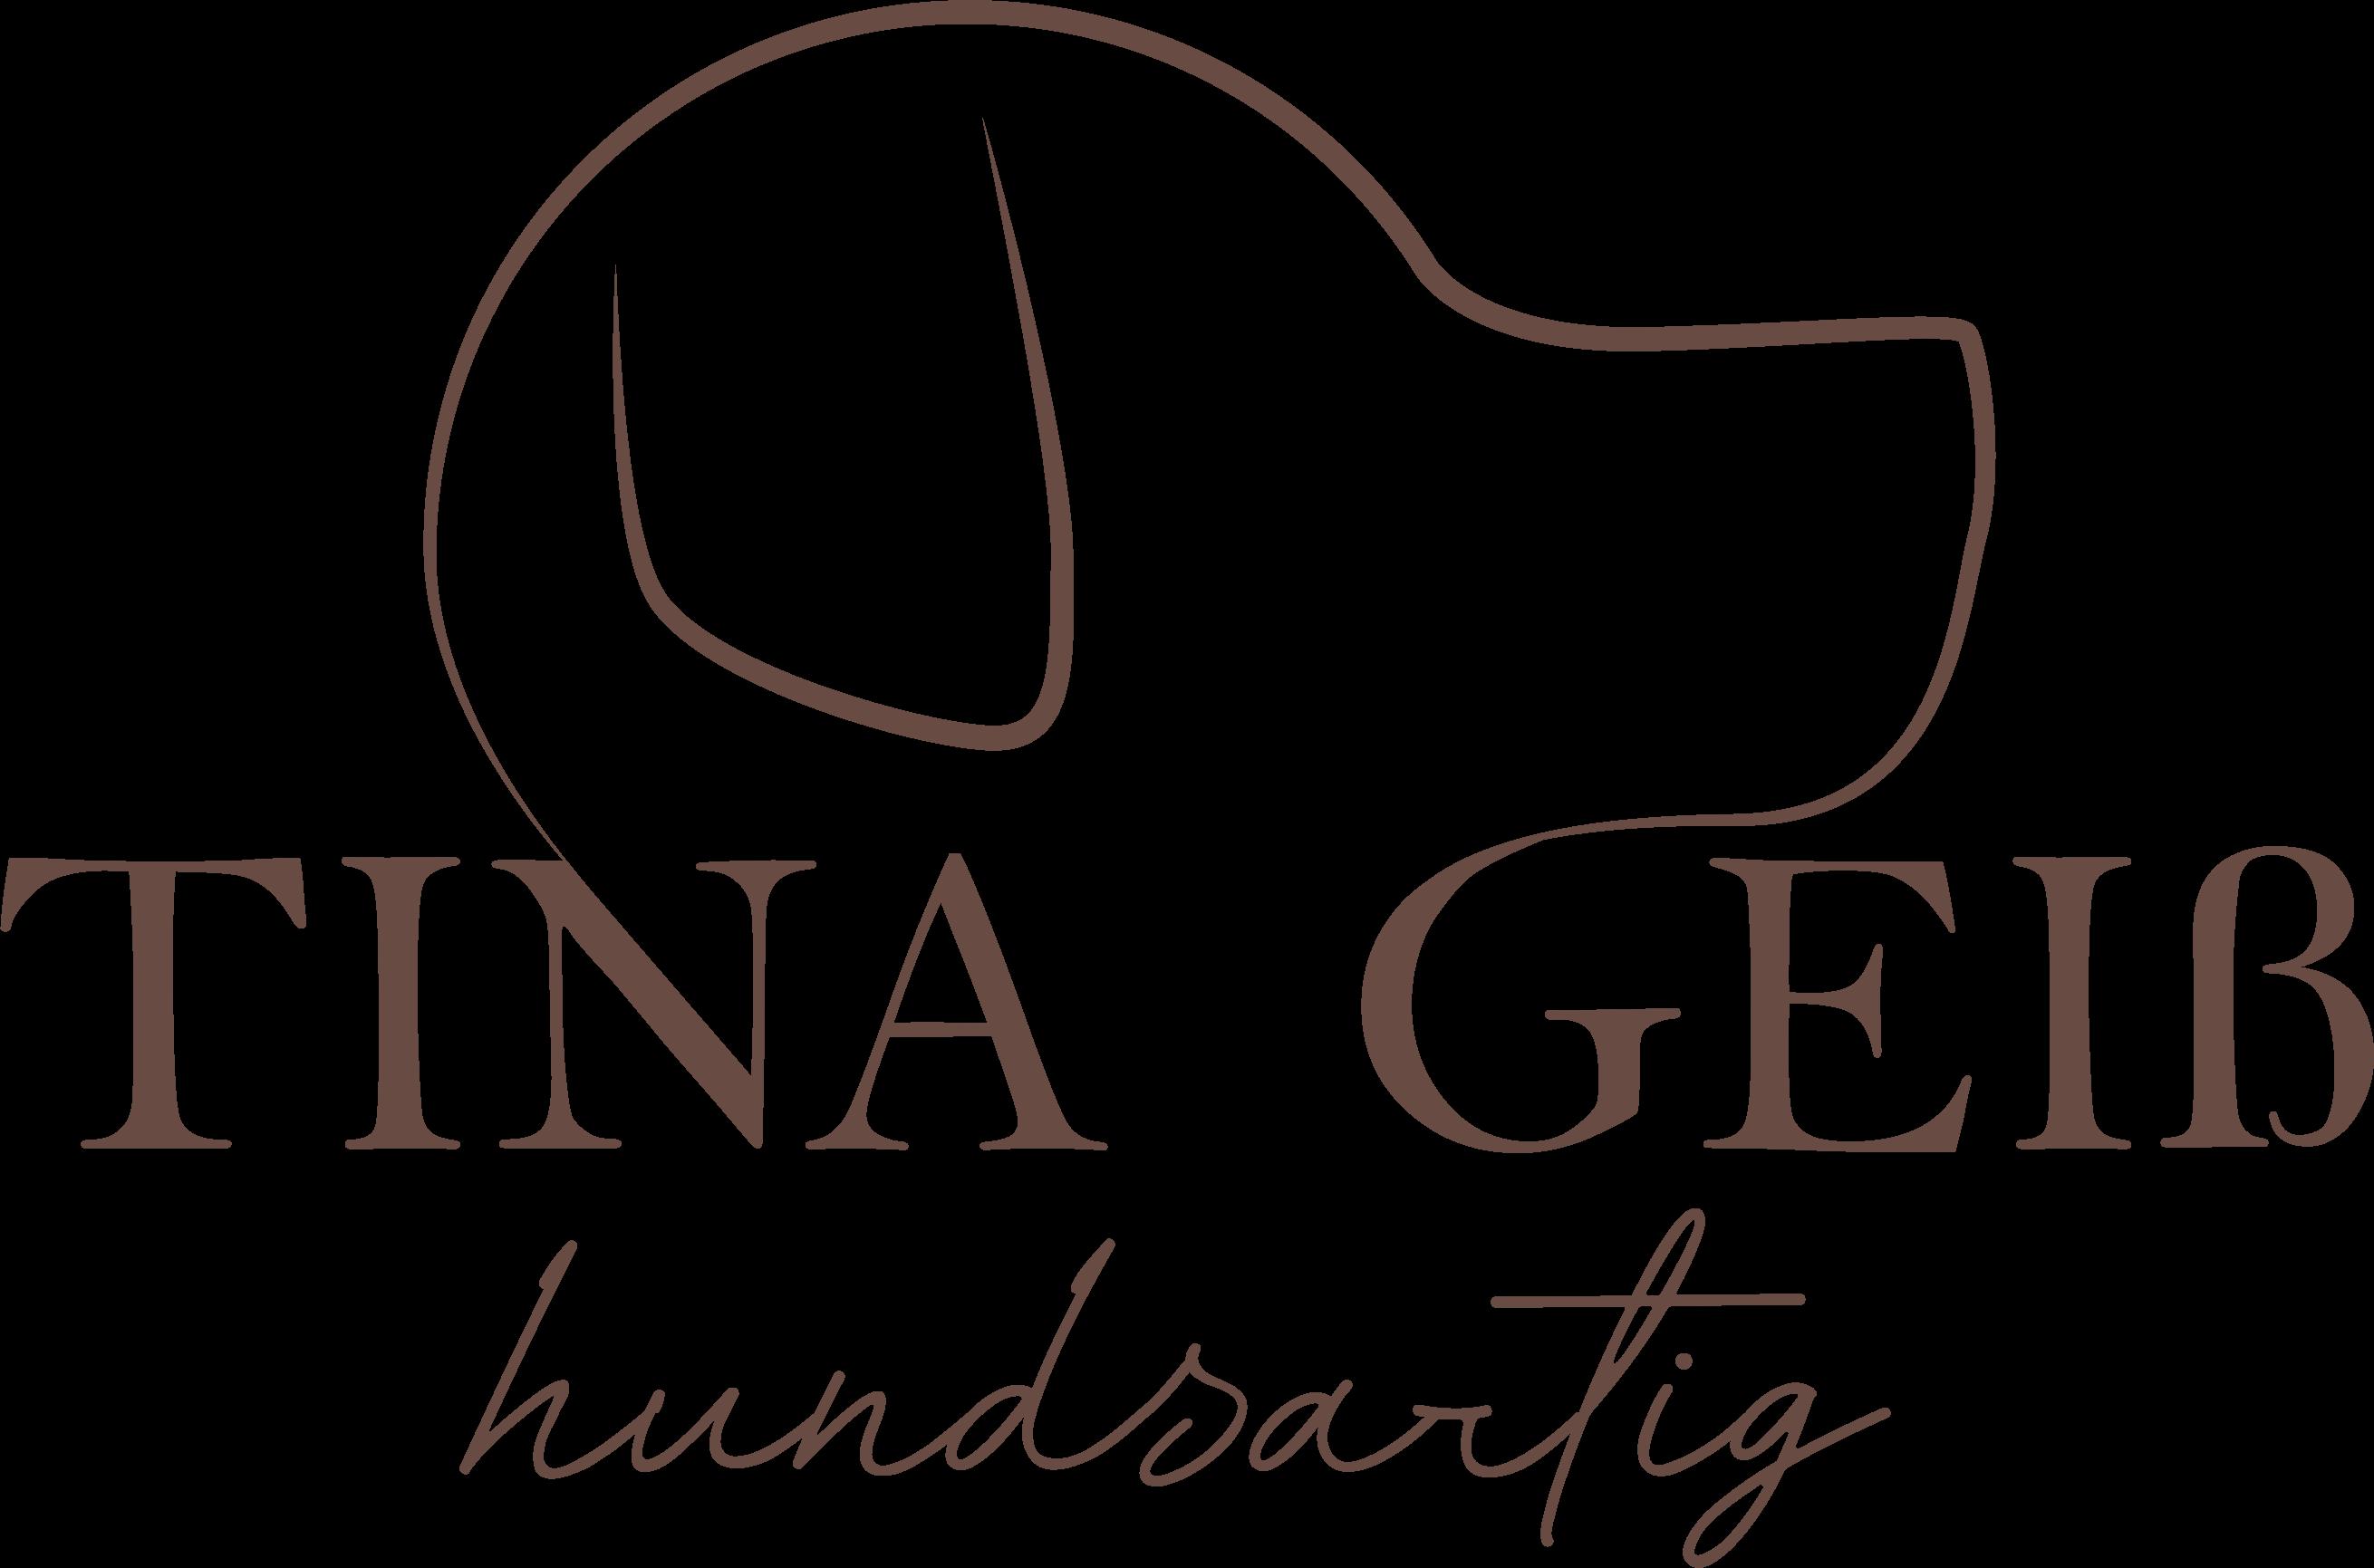 Hundsartig.Tina Geiß.Hundeschule.Hundetrainer.Hundepension.Begegnungshof. Fachkraft tiergestützte Pädagogik in Siegen und Umgebeung